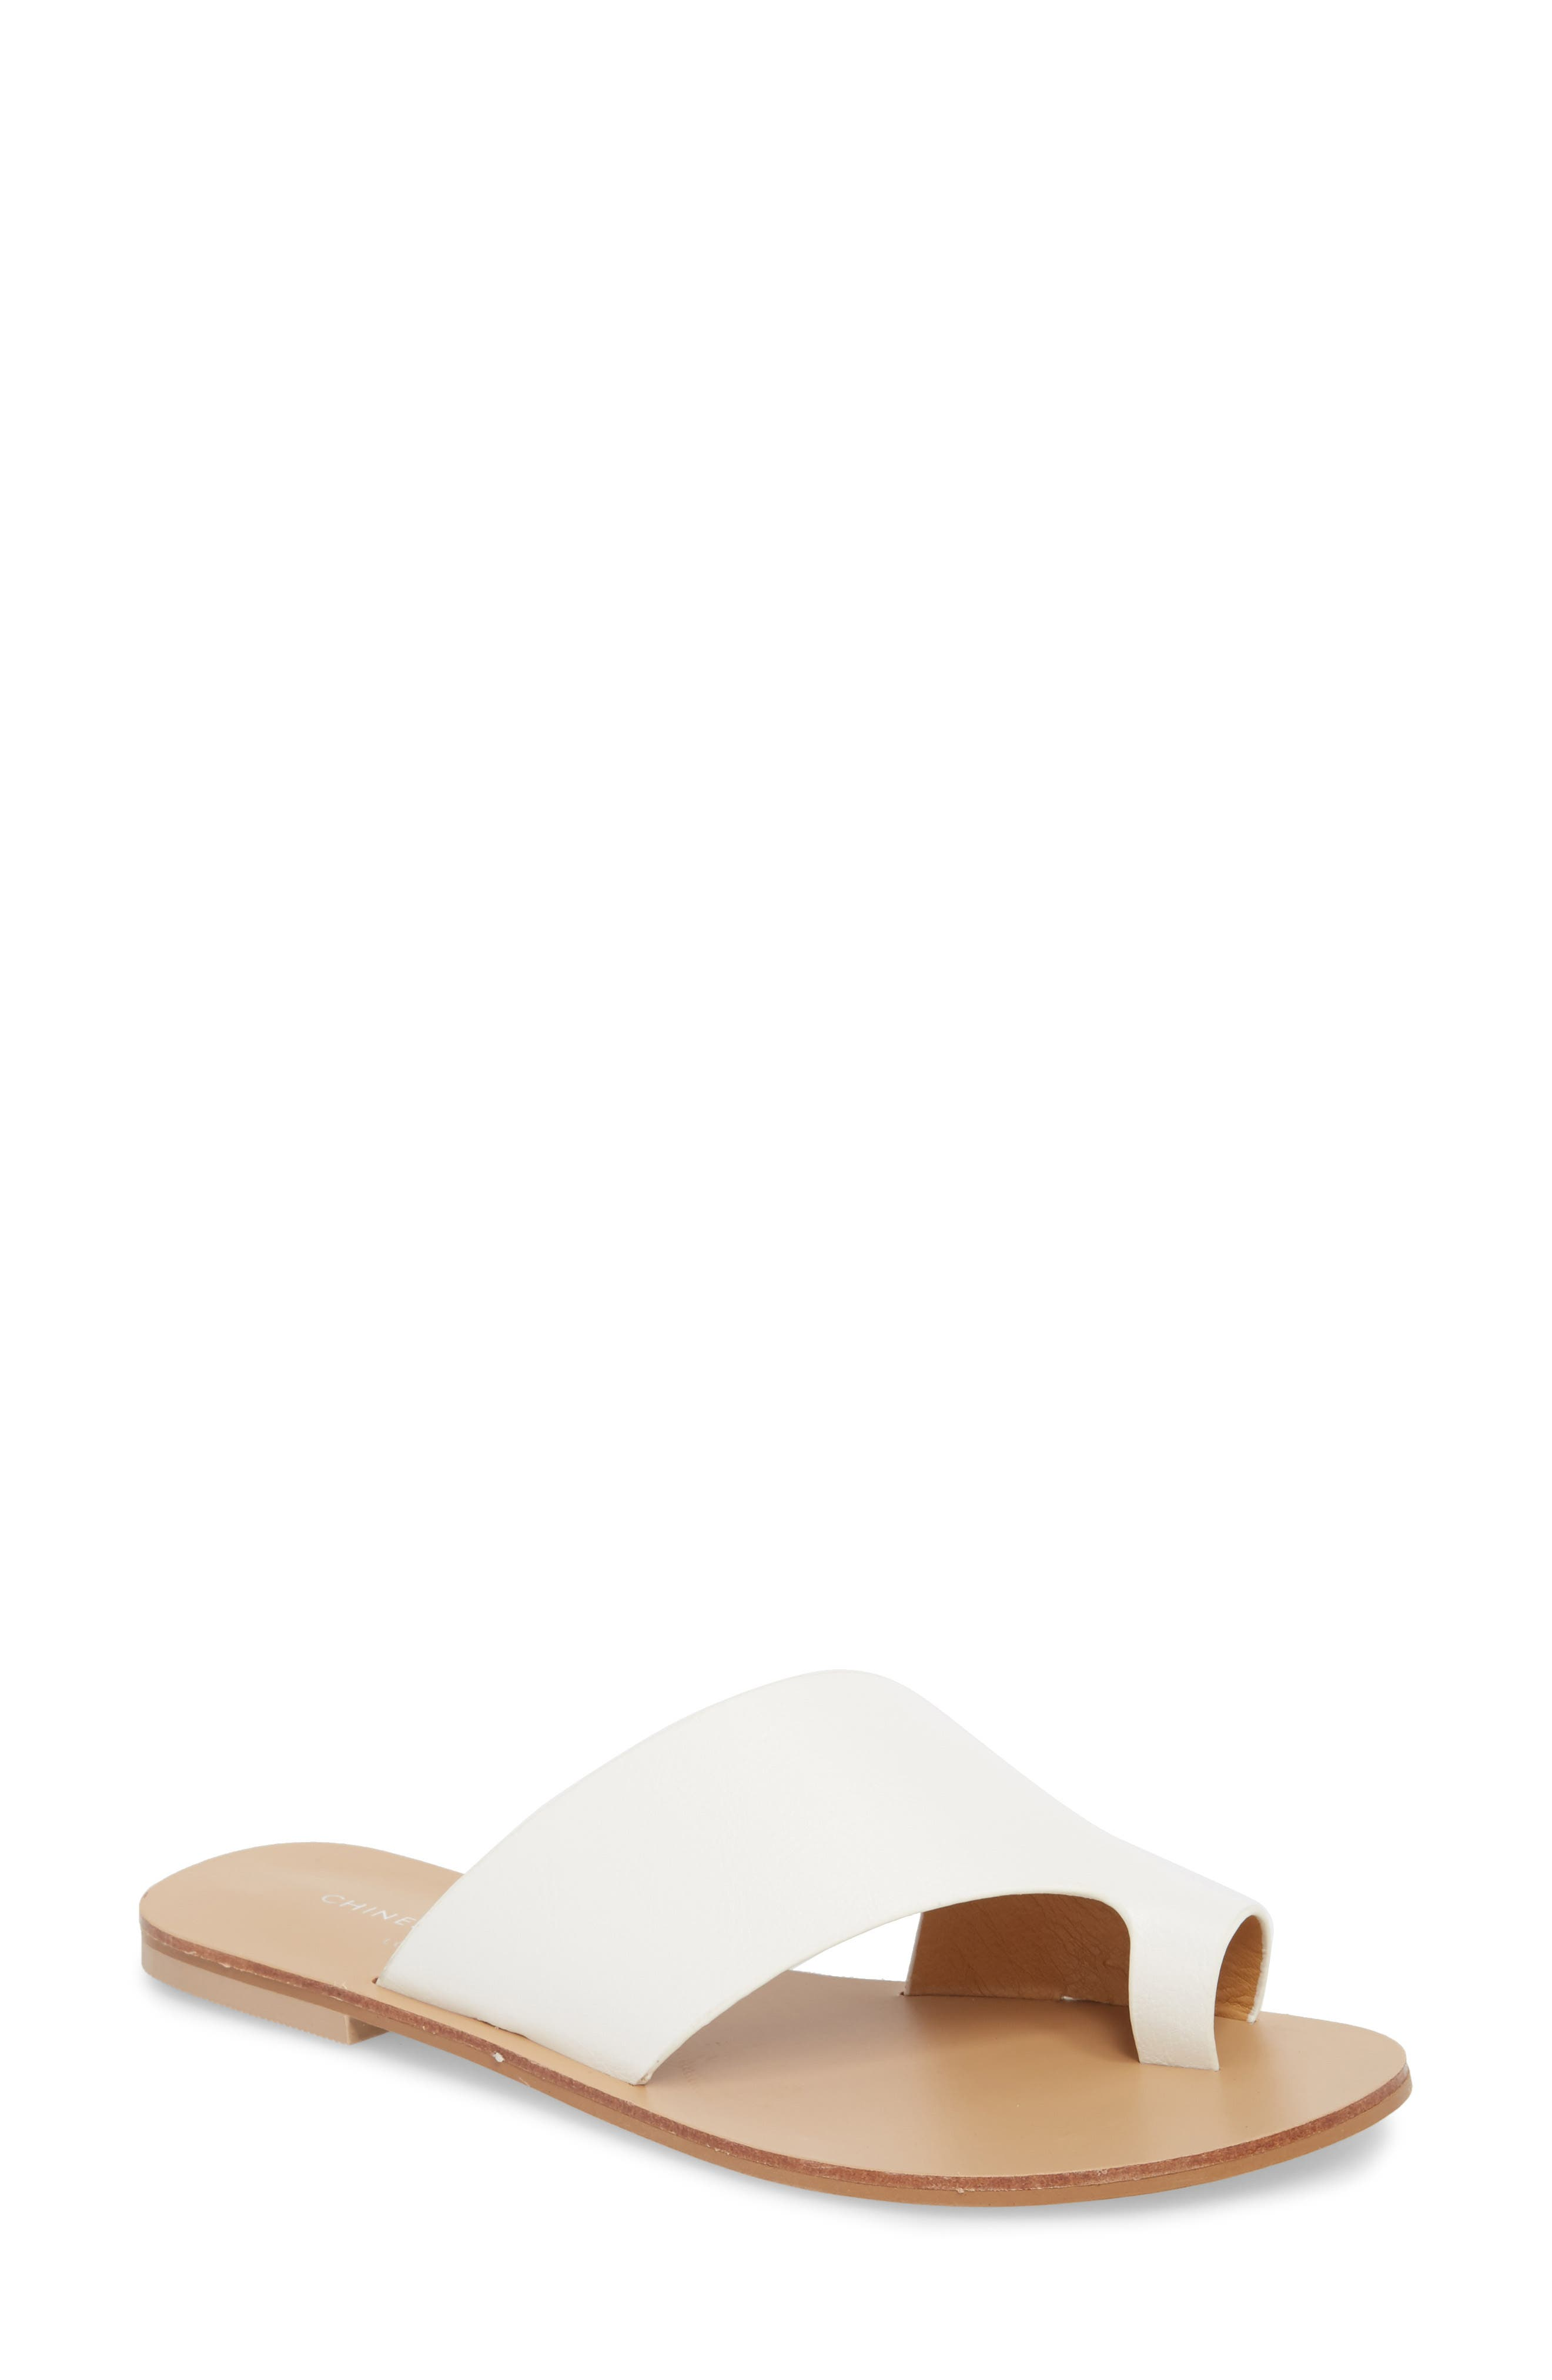 Glory Asymmetrical Slide Sandal,                         Main,                         color, WHITE